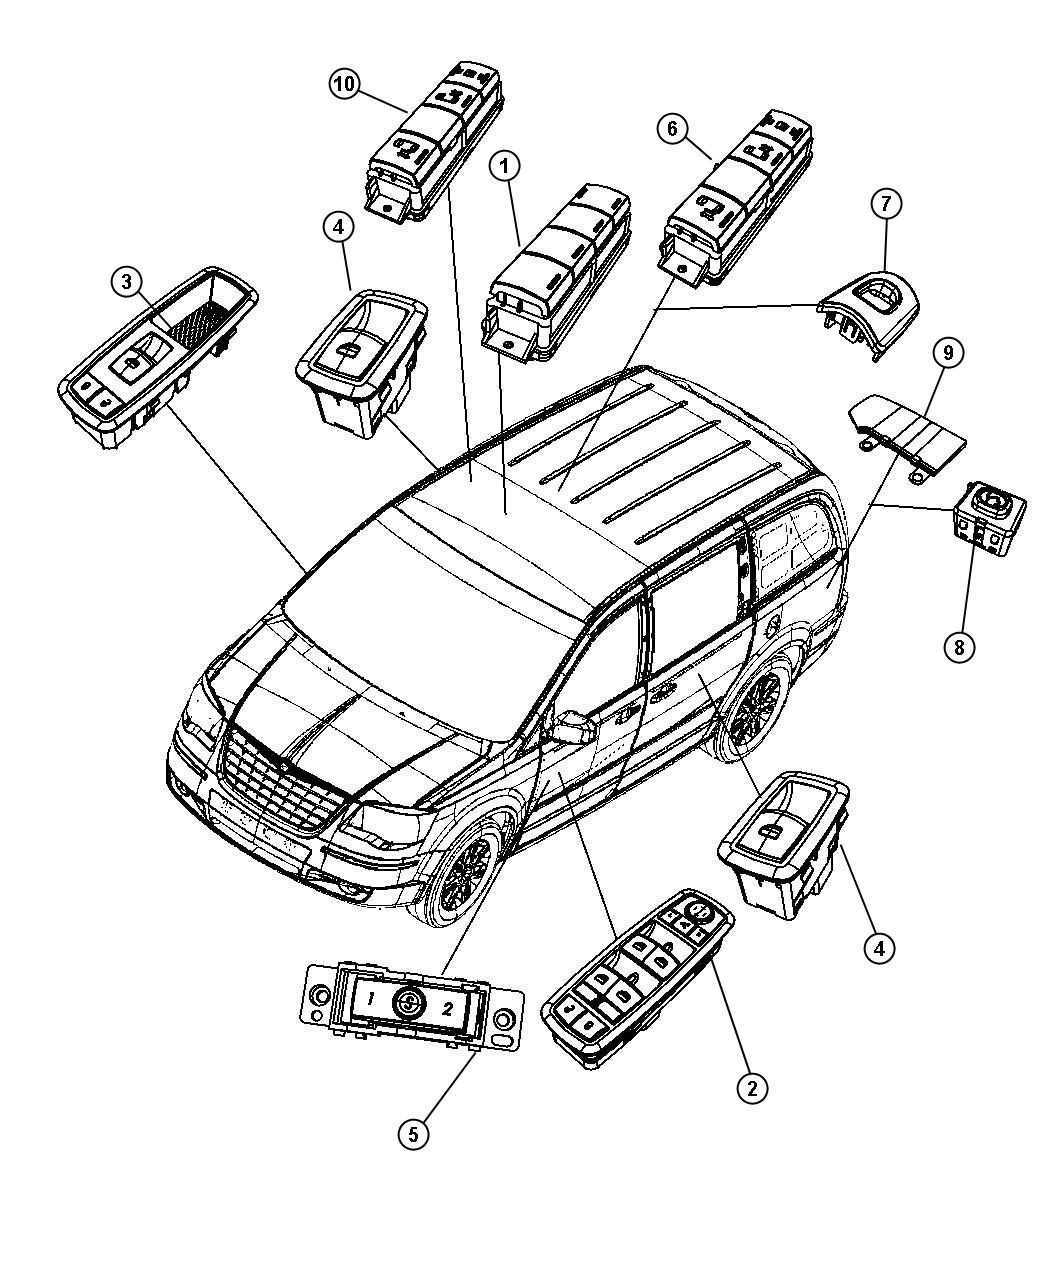 2010 Dodge Grand Caravan Switch  Power Window  Driver Side